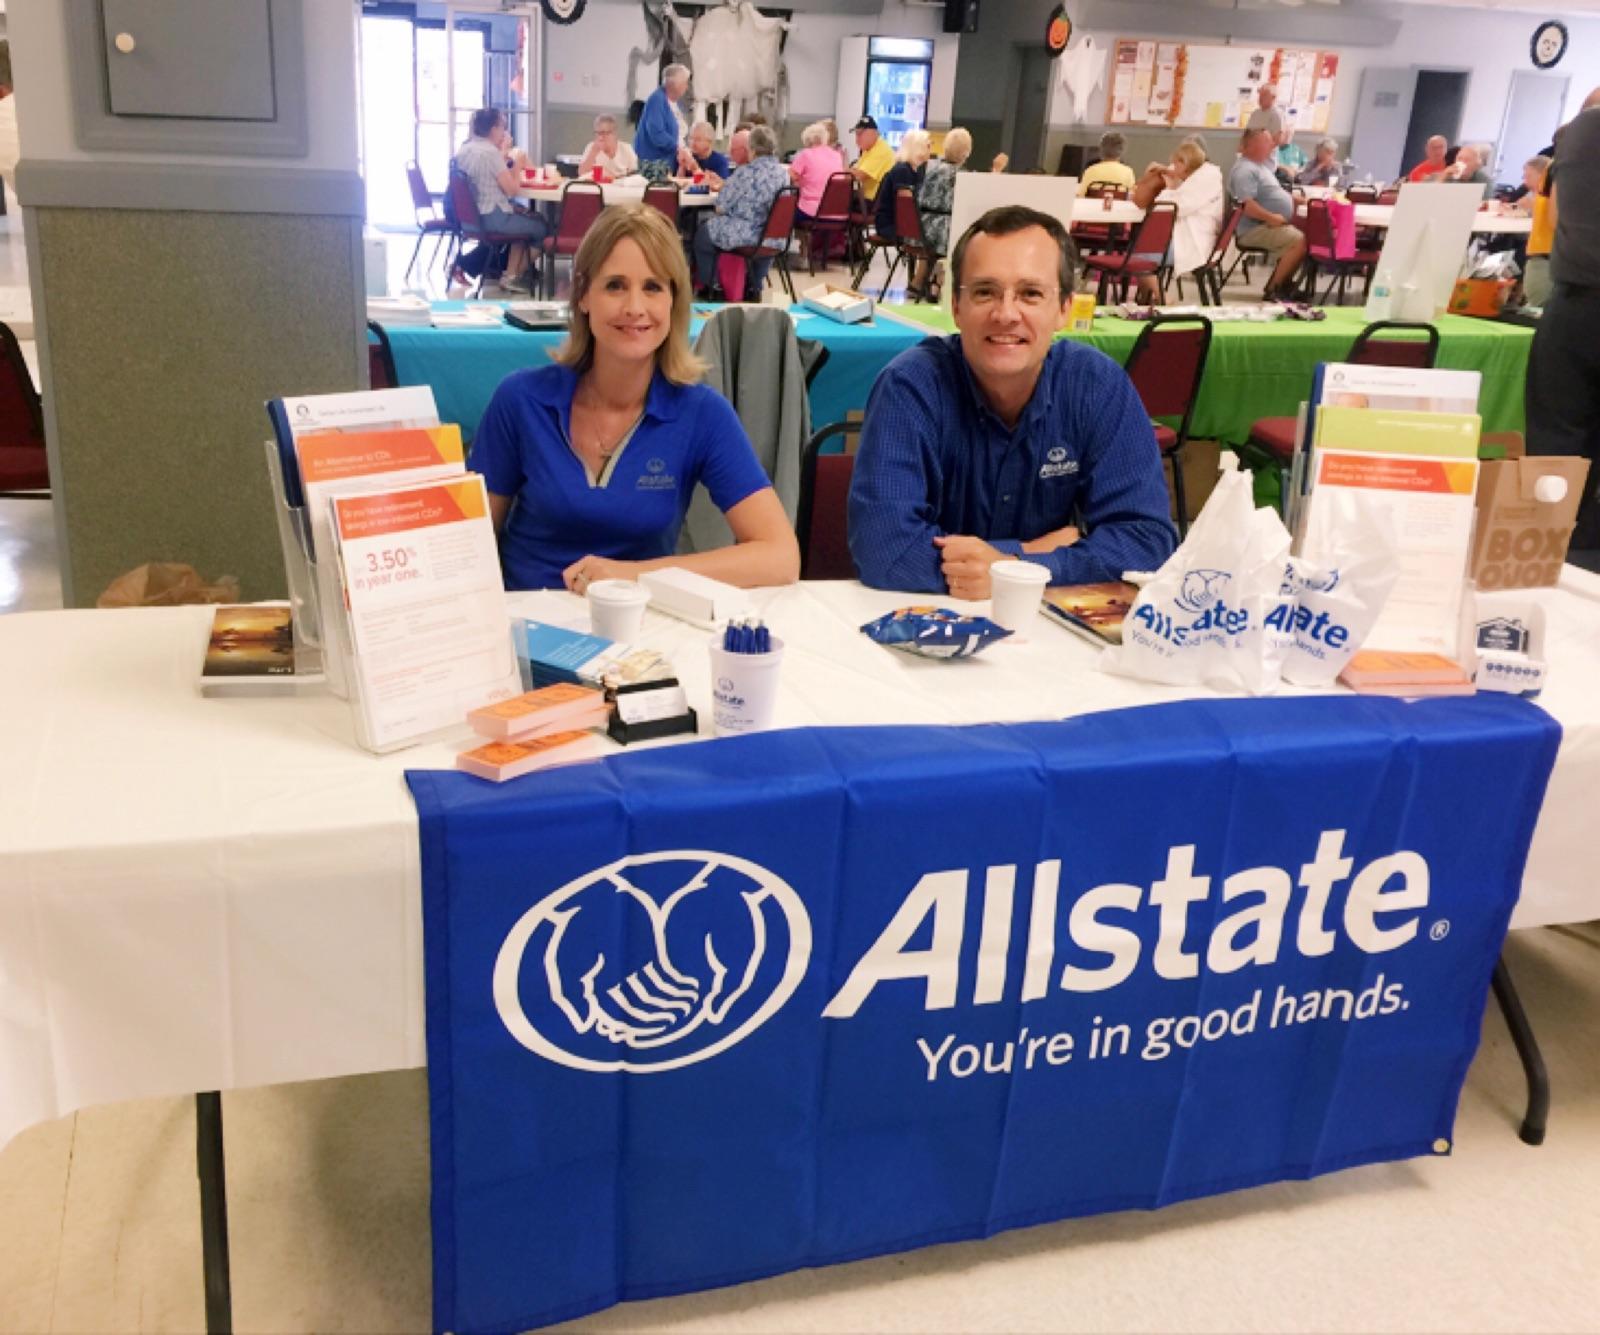 Car Insurance In Florida: Car Insurance In Spring Hill, FL - Scott Moore